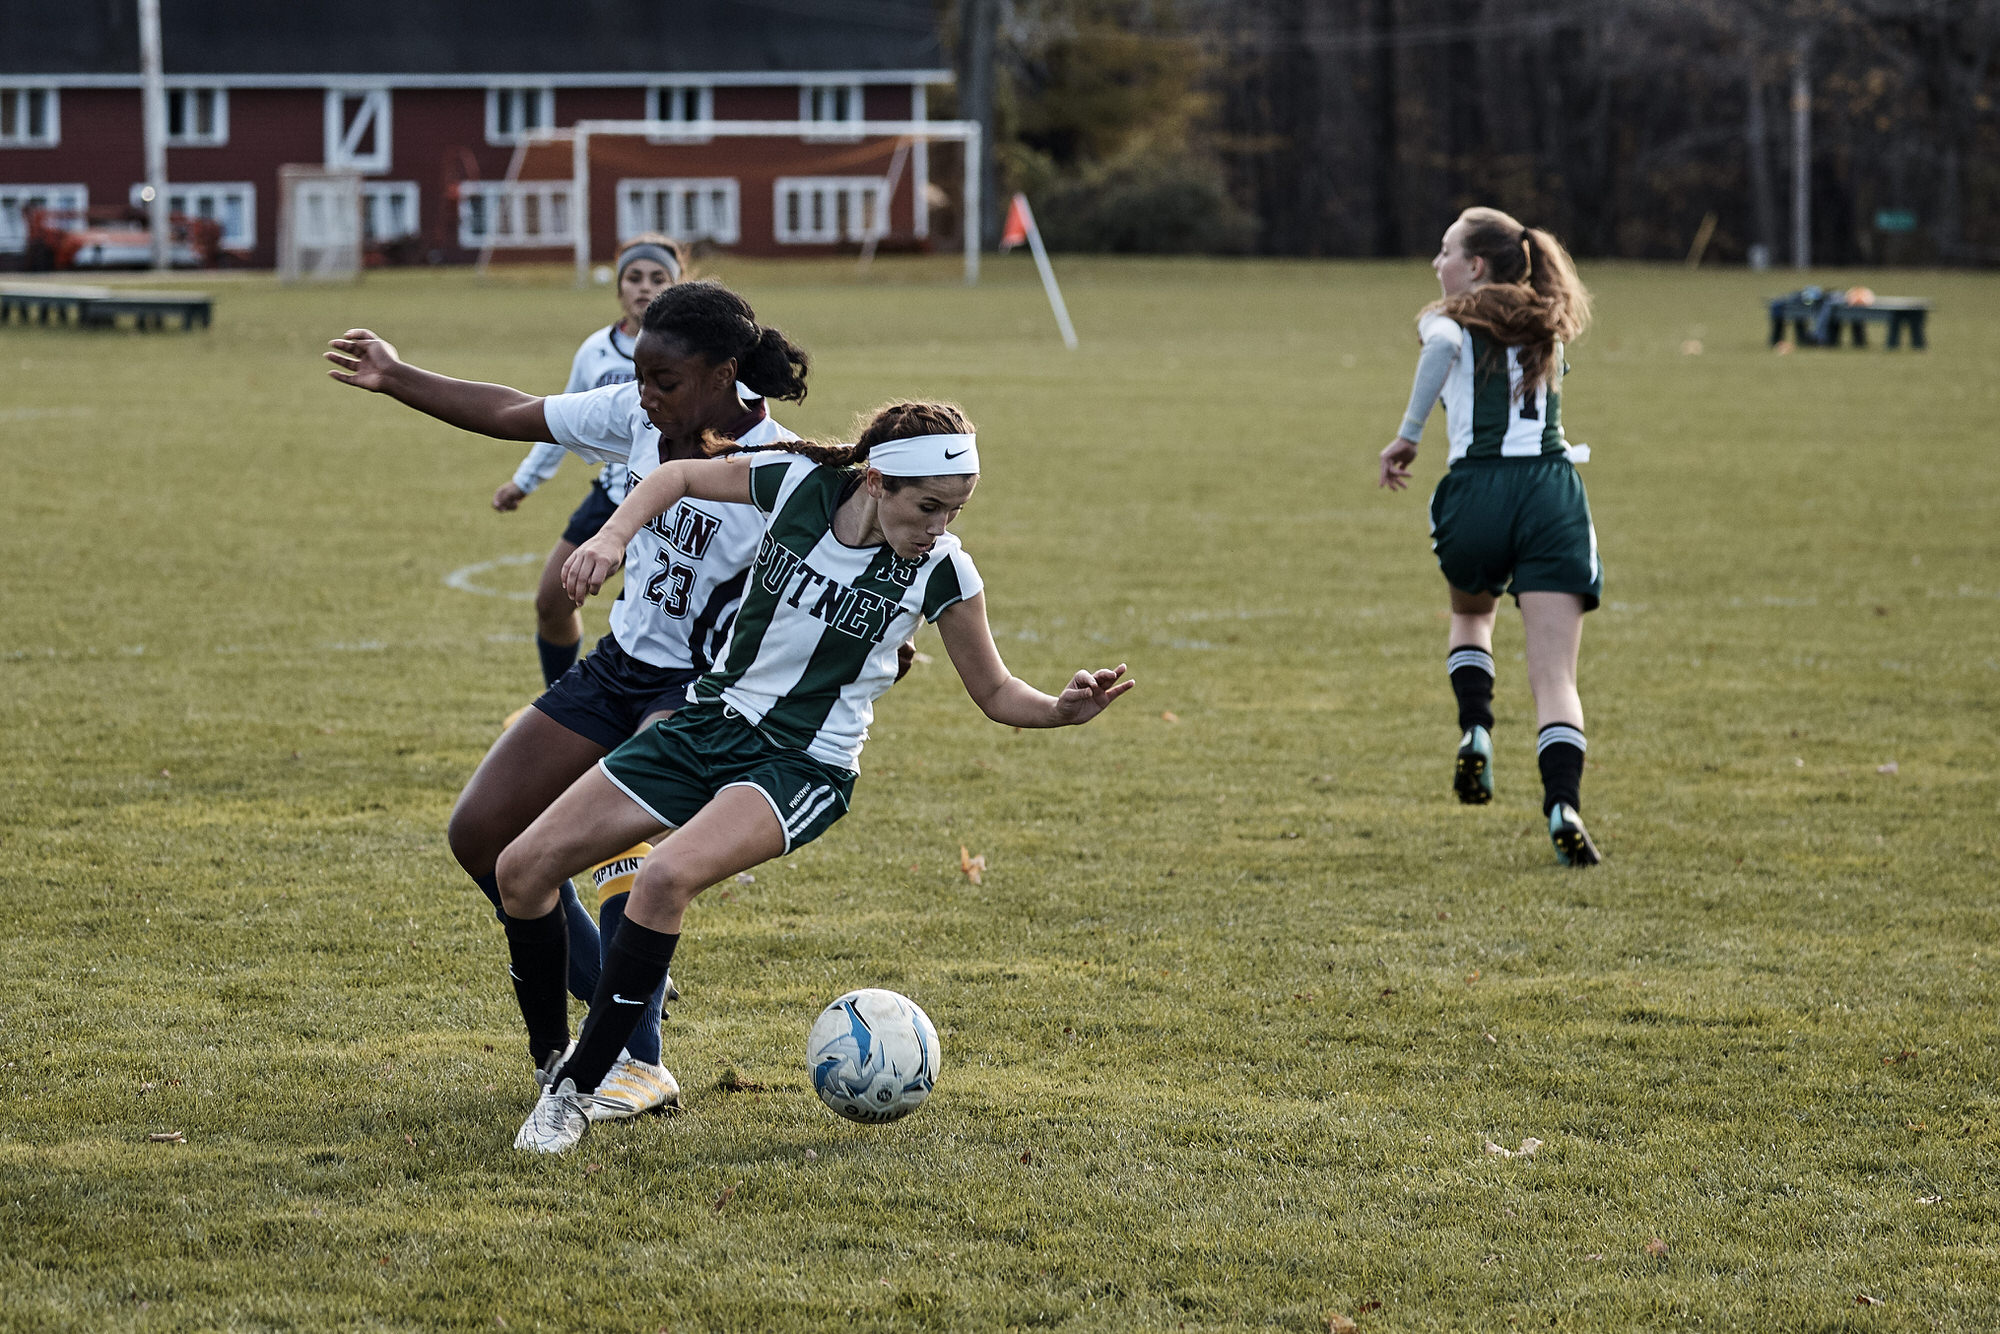 Girls Varsity Soccer vs. Putney School - October 26, 2018 - 050.jpg